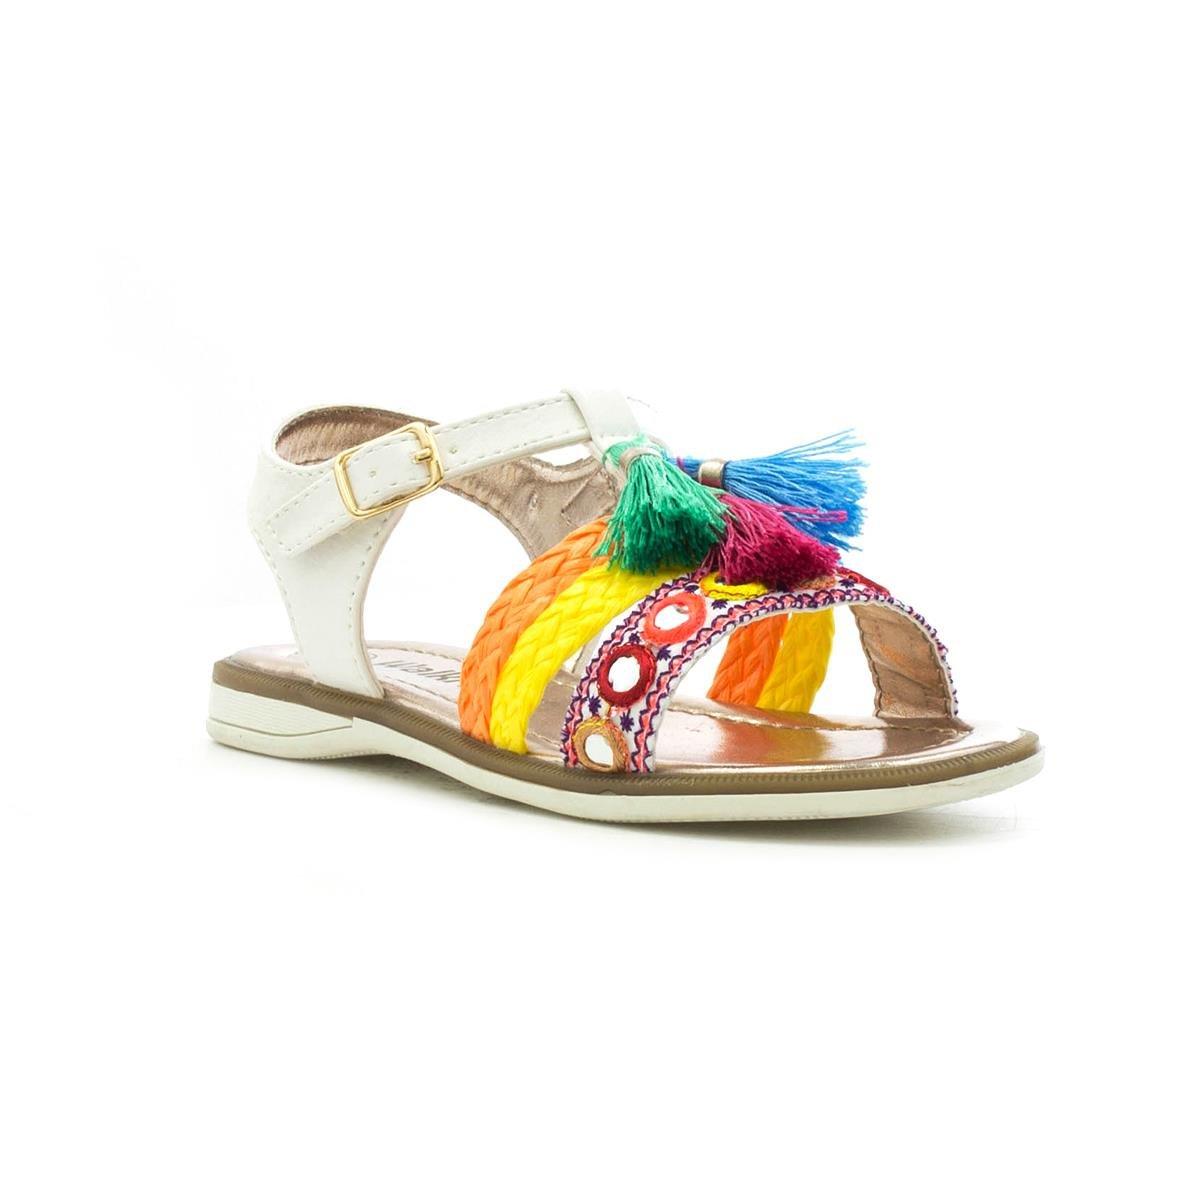 22f829b0f80d Walkright Girls White Tassel Flat Sandal  Amazon.co.uk  Shoes   Bags